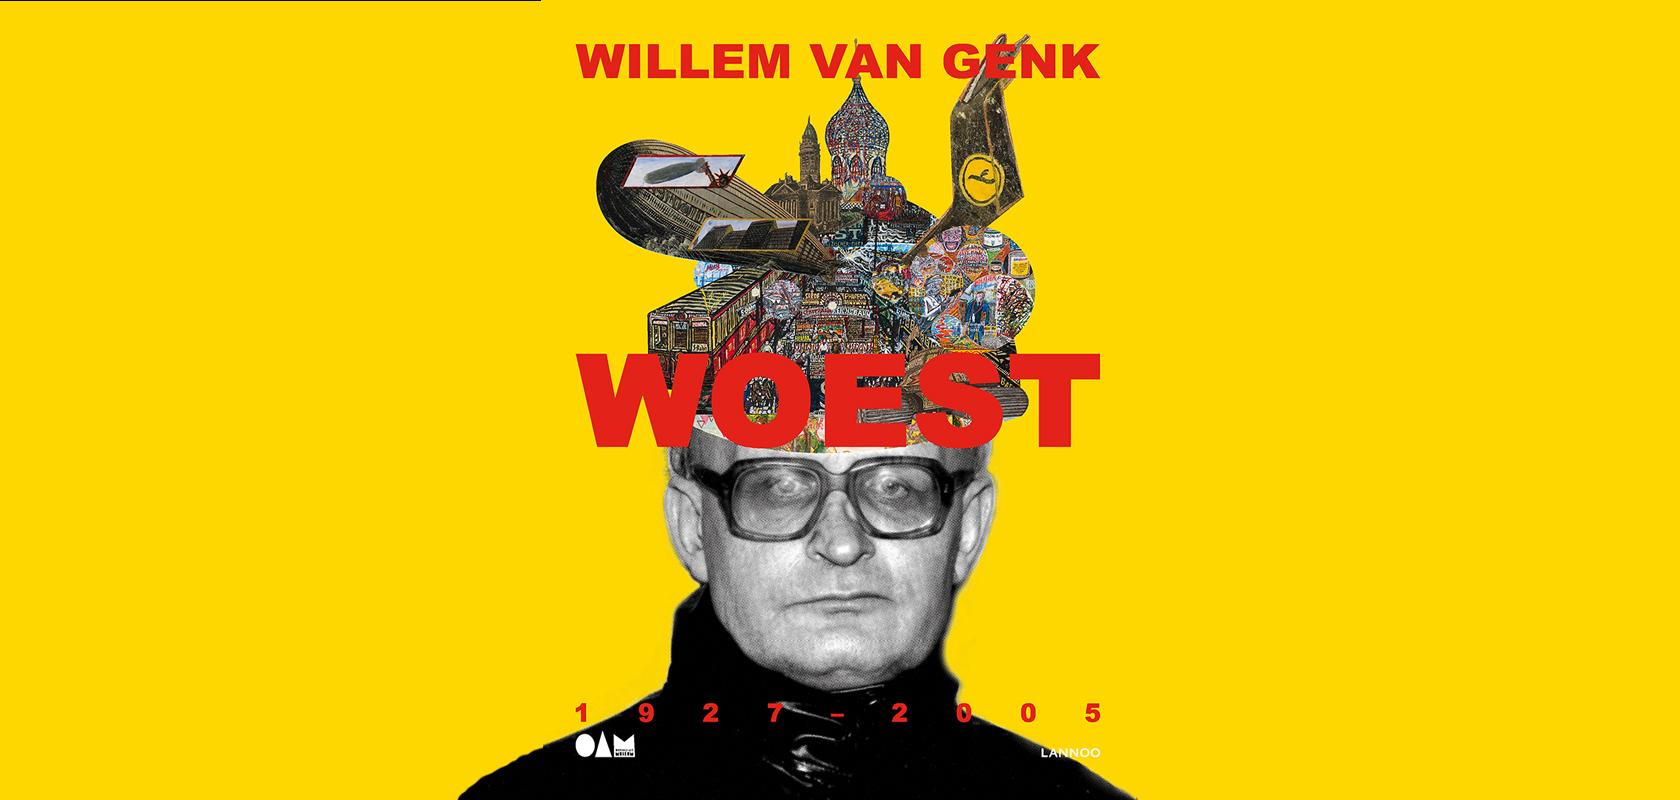 Woest-Willem-van-Genk-slider